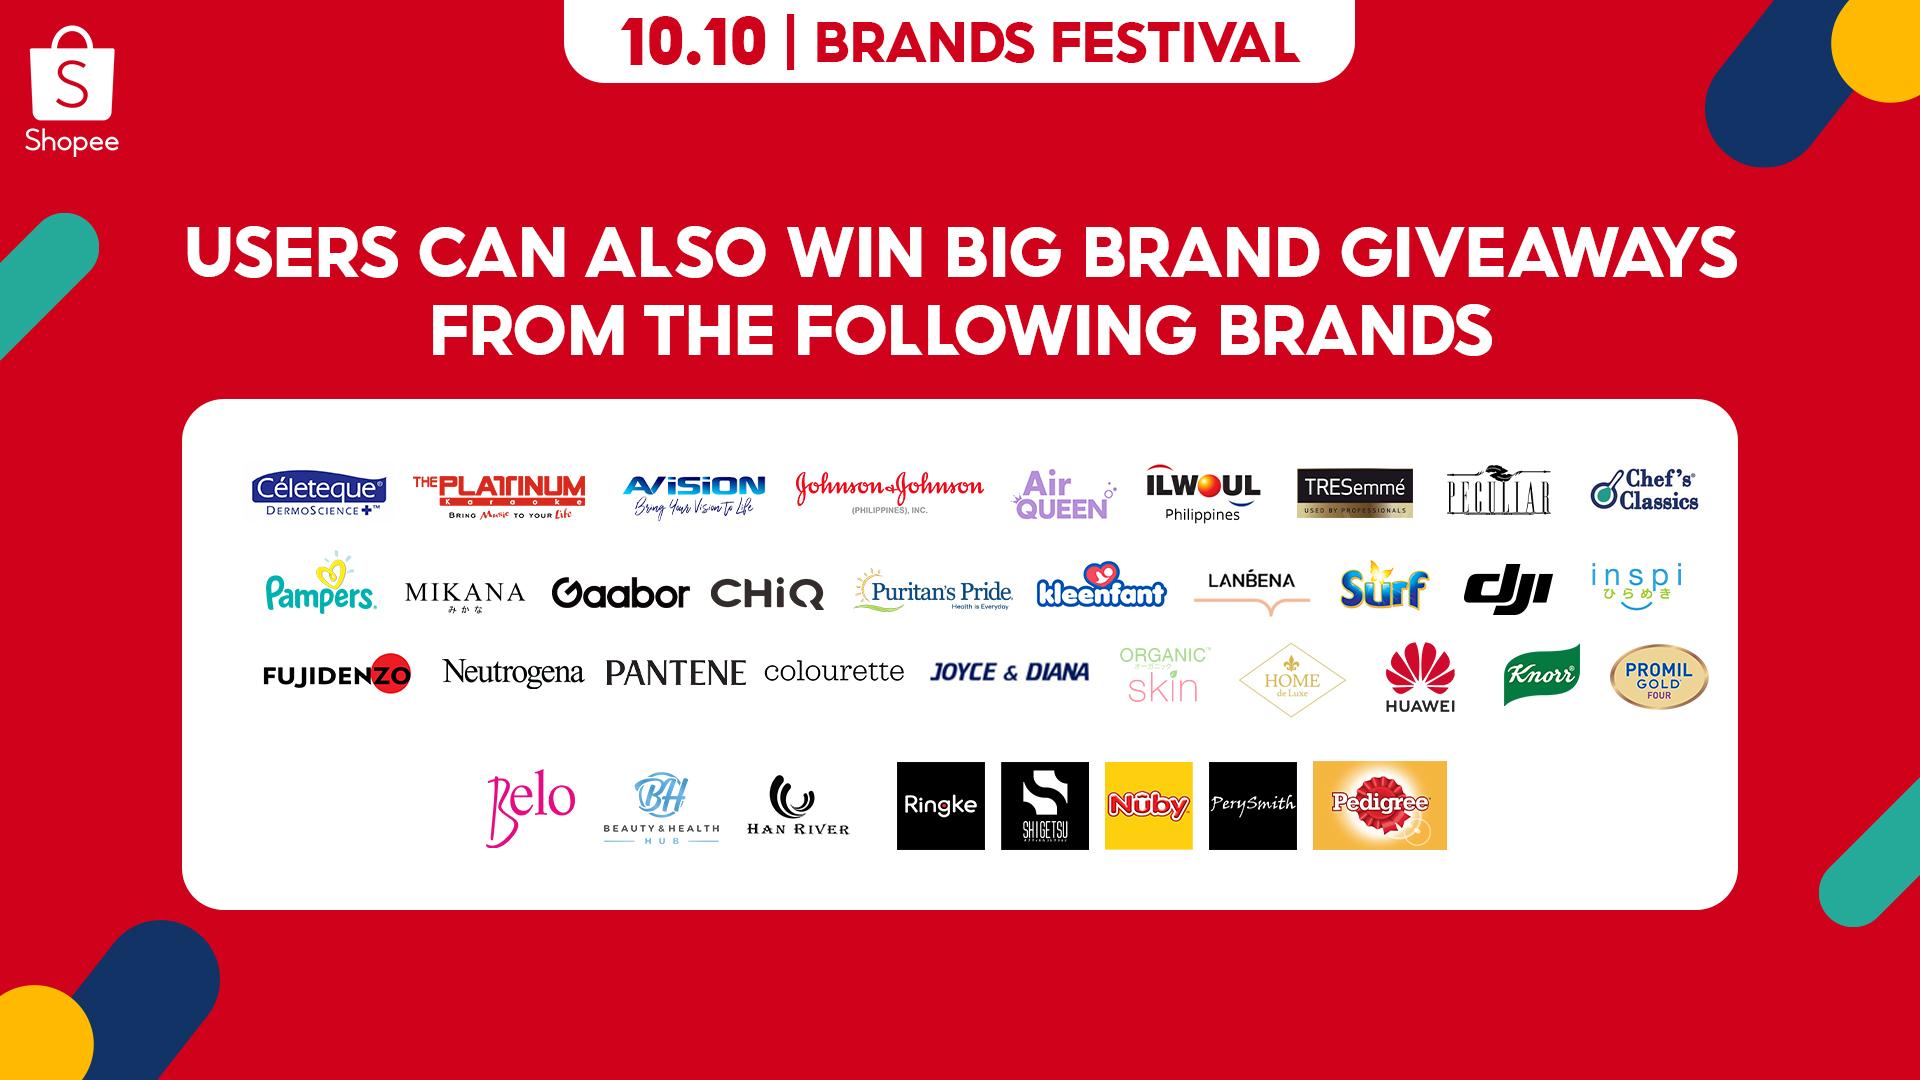 10.10 Launch PR Big Brand Giveaways